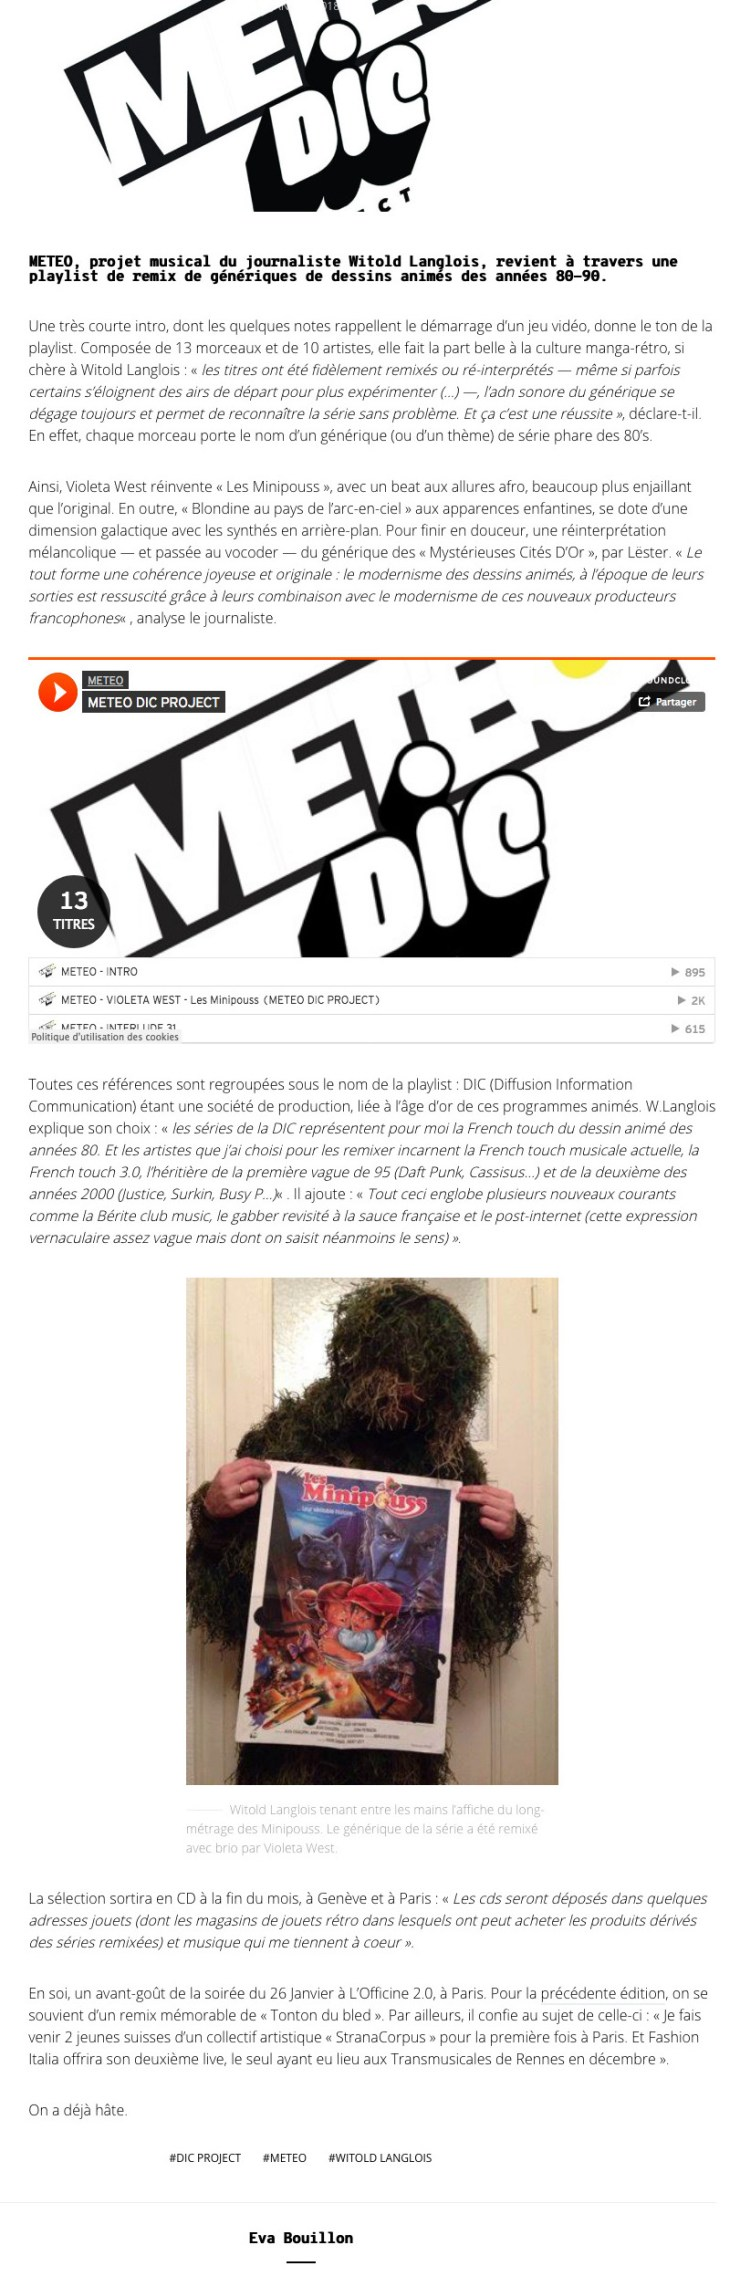 Screenshot-2018-3-11 DIC PROJECT la playlist rétro-manga de METEO